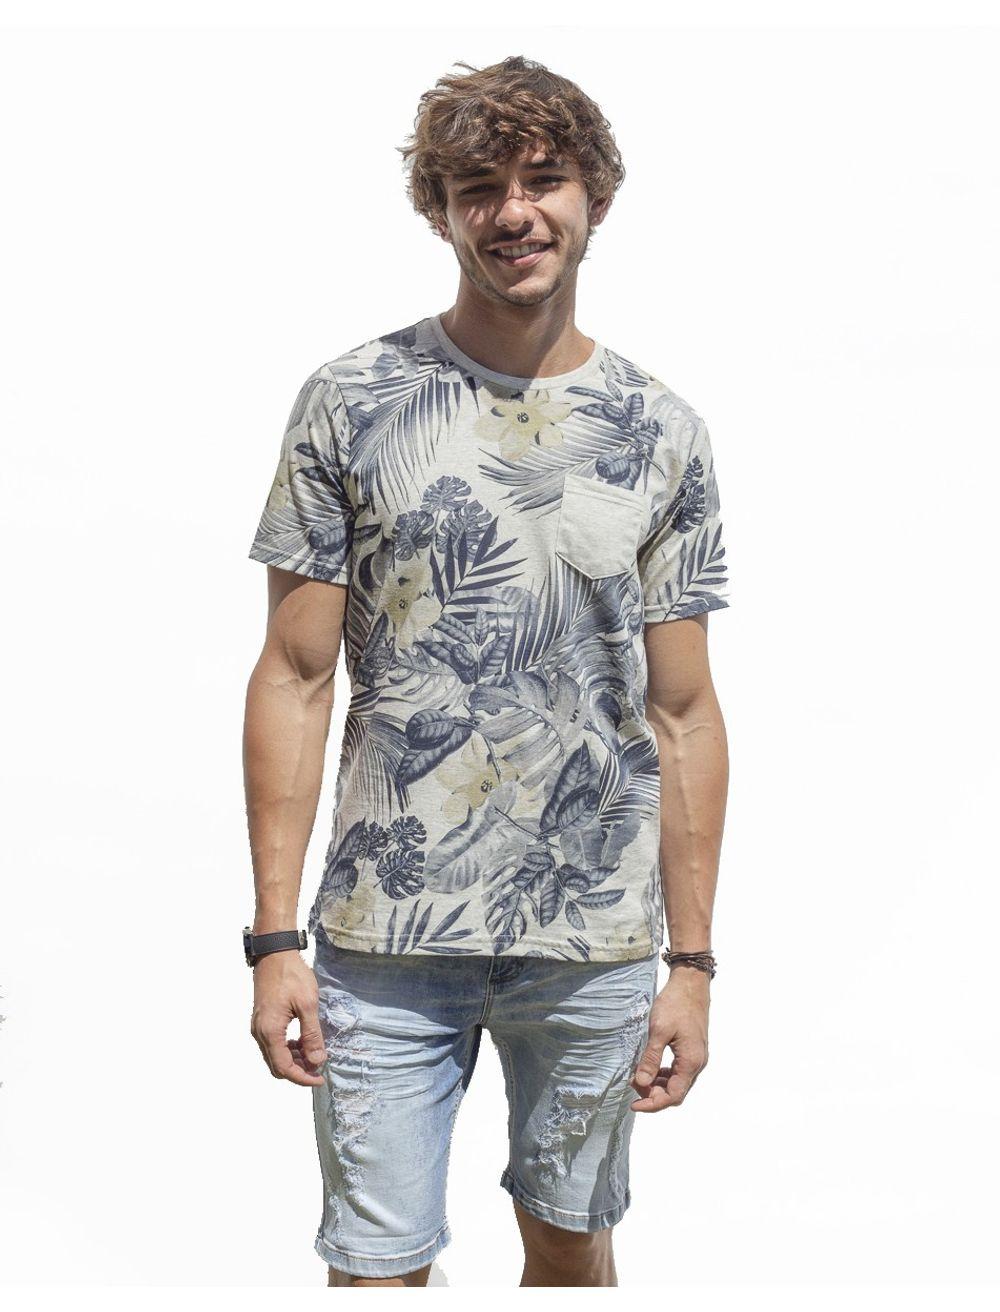 2050005675664-Camiseta-Manga-Curta-Masculina-Estampa-Tropical-MESCLA-P-1